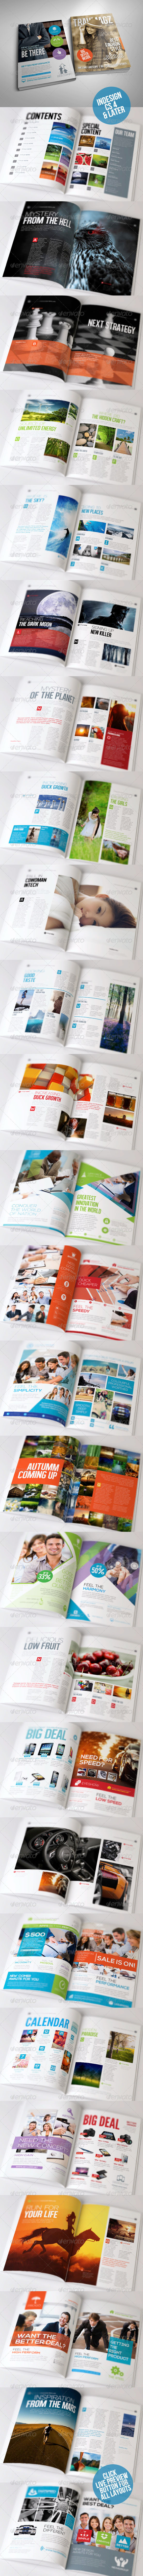 GraphicRiver Simple Magazine Volume II 5461504